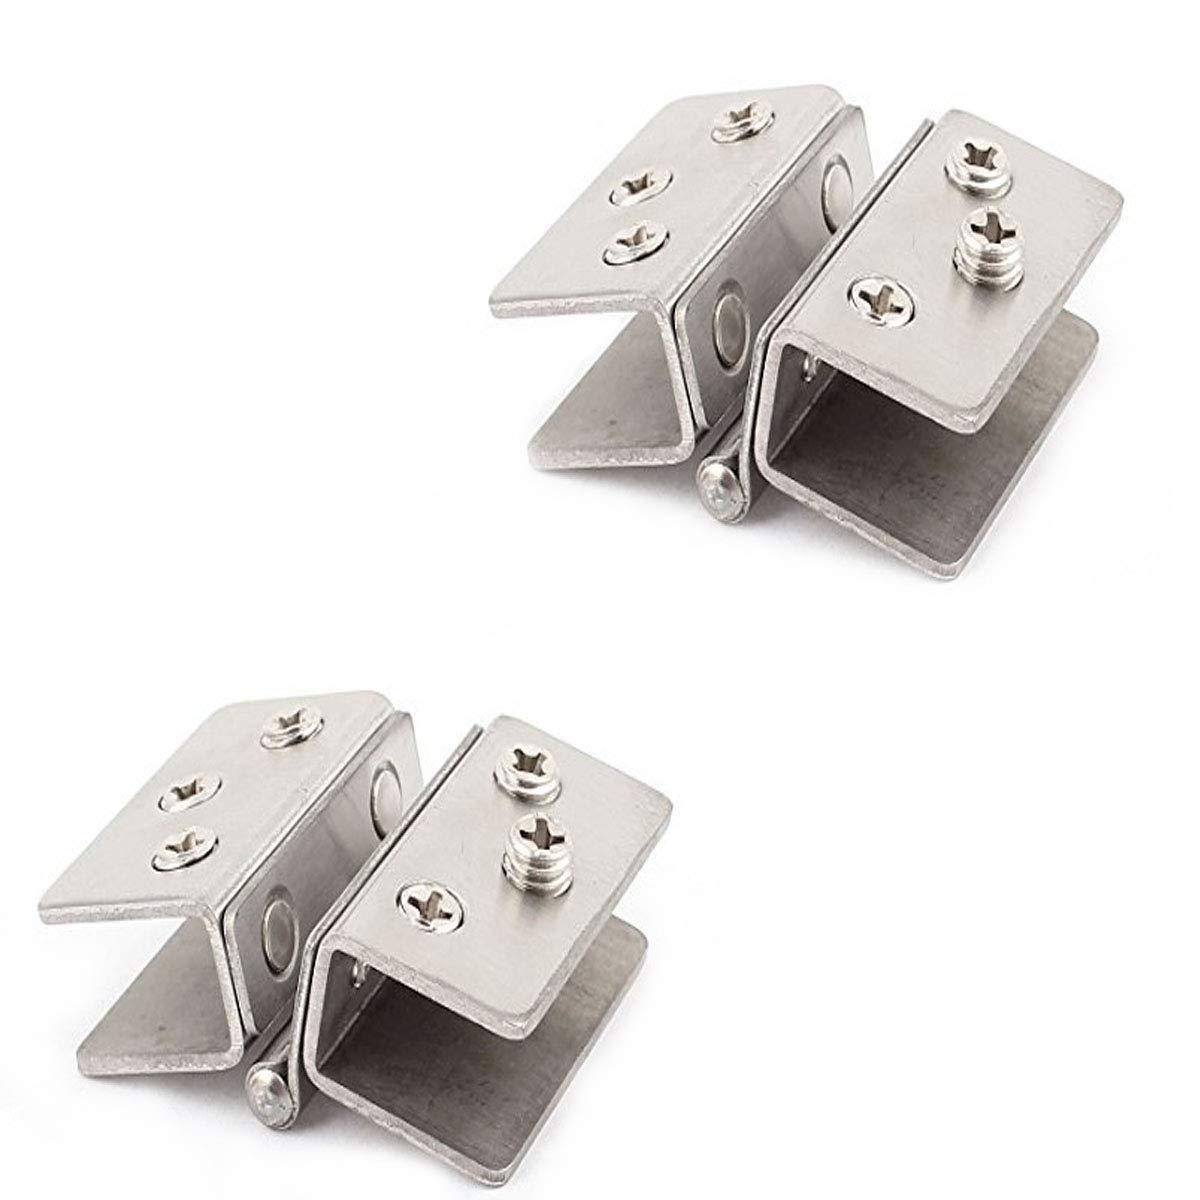 COMOK Adjustable Silver Tone Glass Door Double Clip Hinges 2PCS